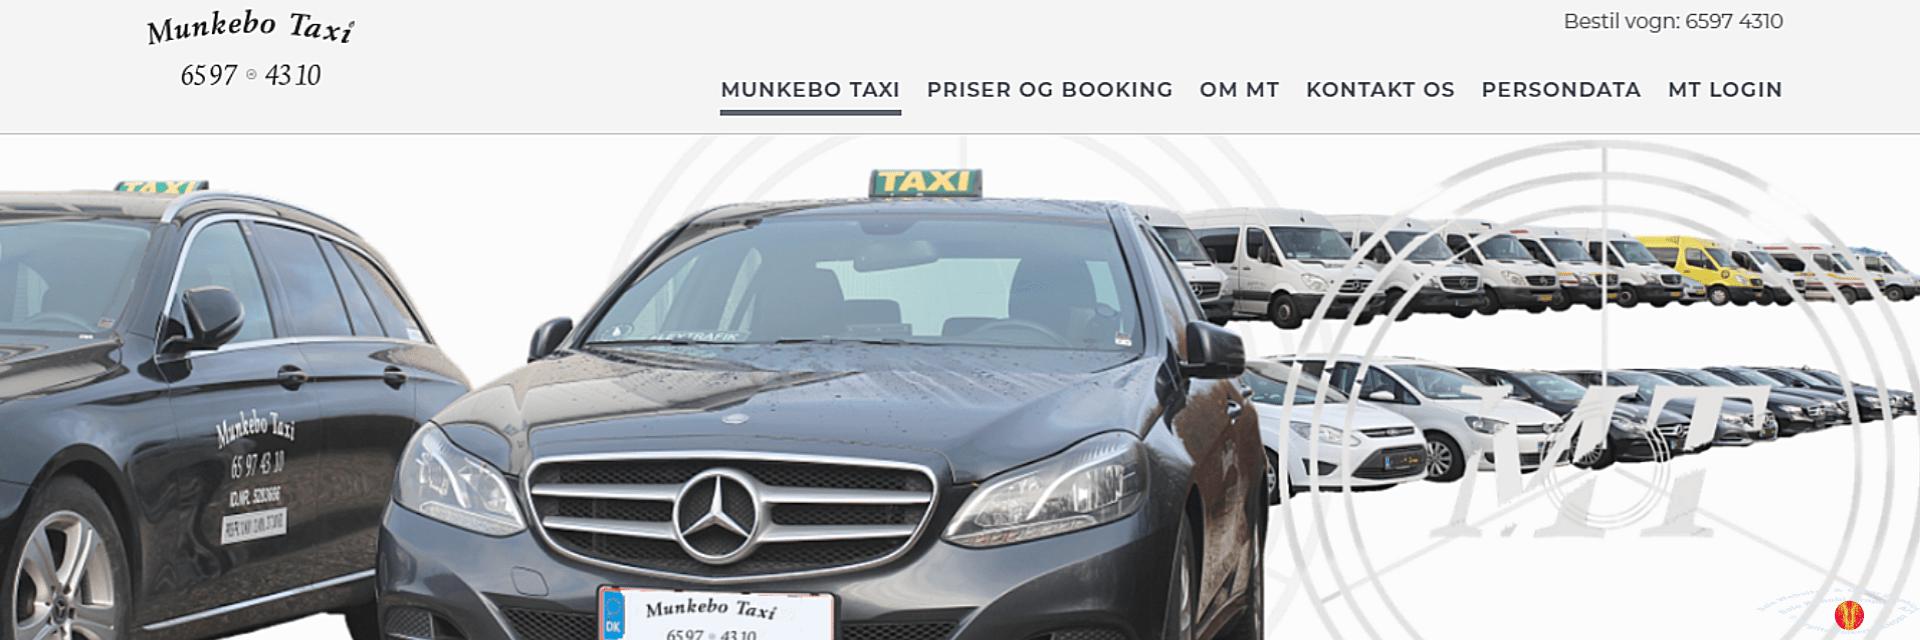 Link Munkebo Taxi Kanobi® frontpage screenprint.